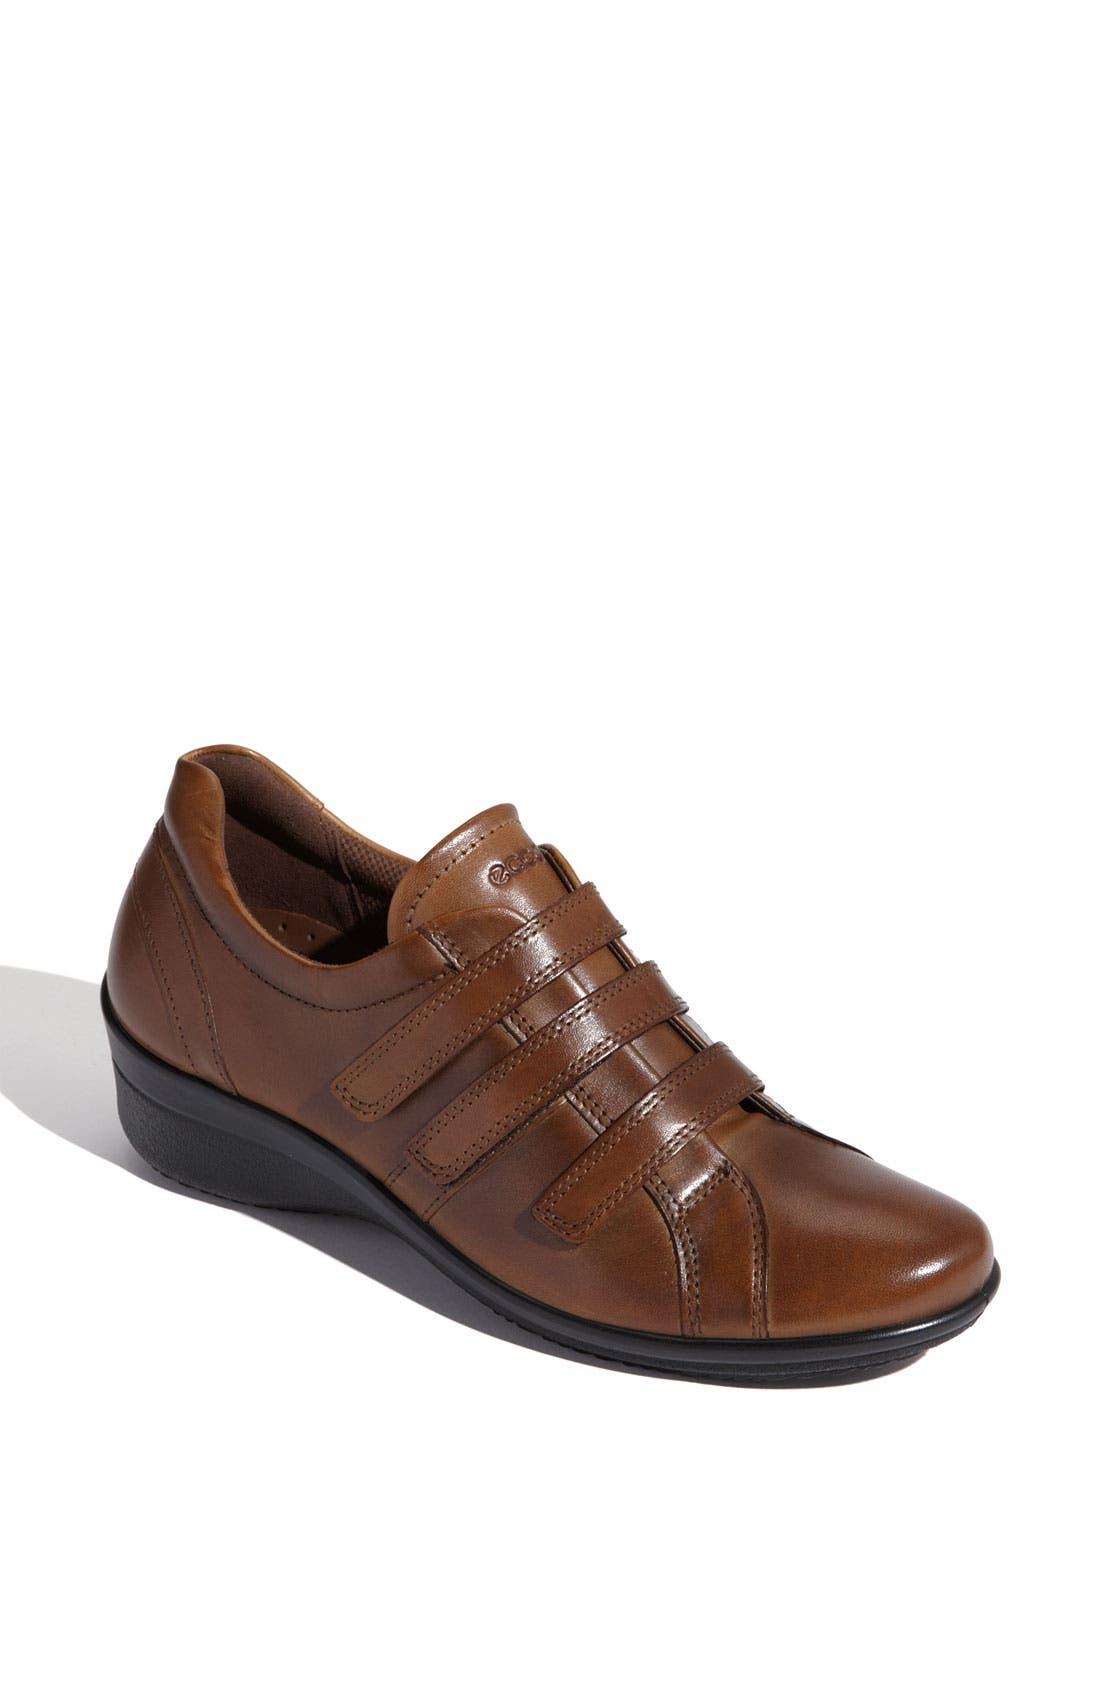 Alternate Image 1 Selected - ECCO 'Corse 3' Shoe